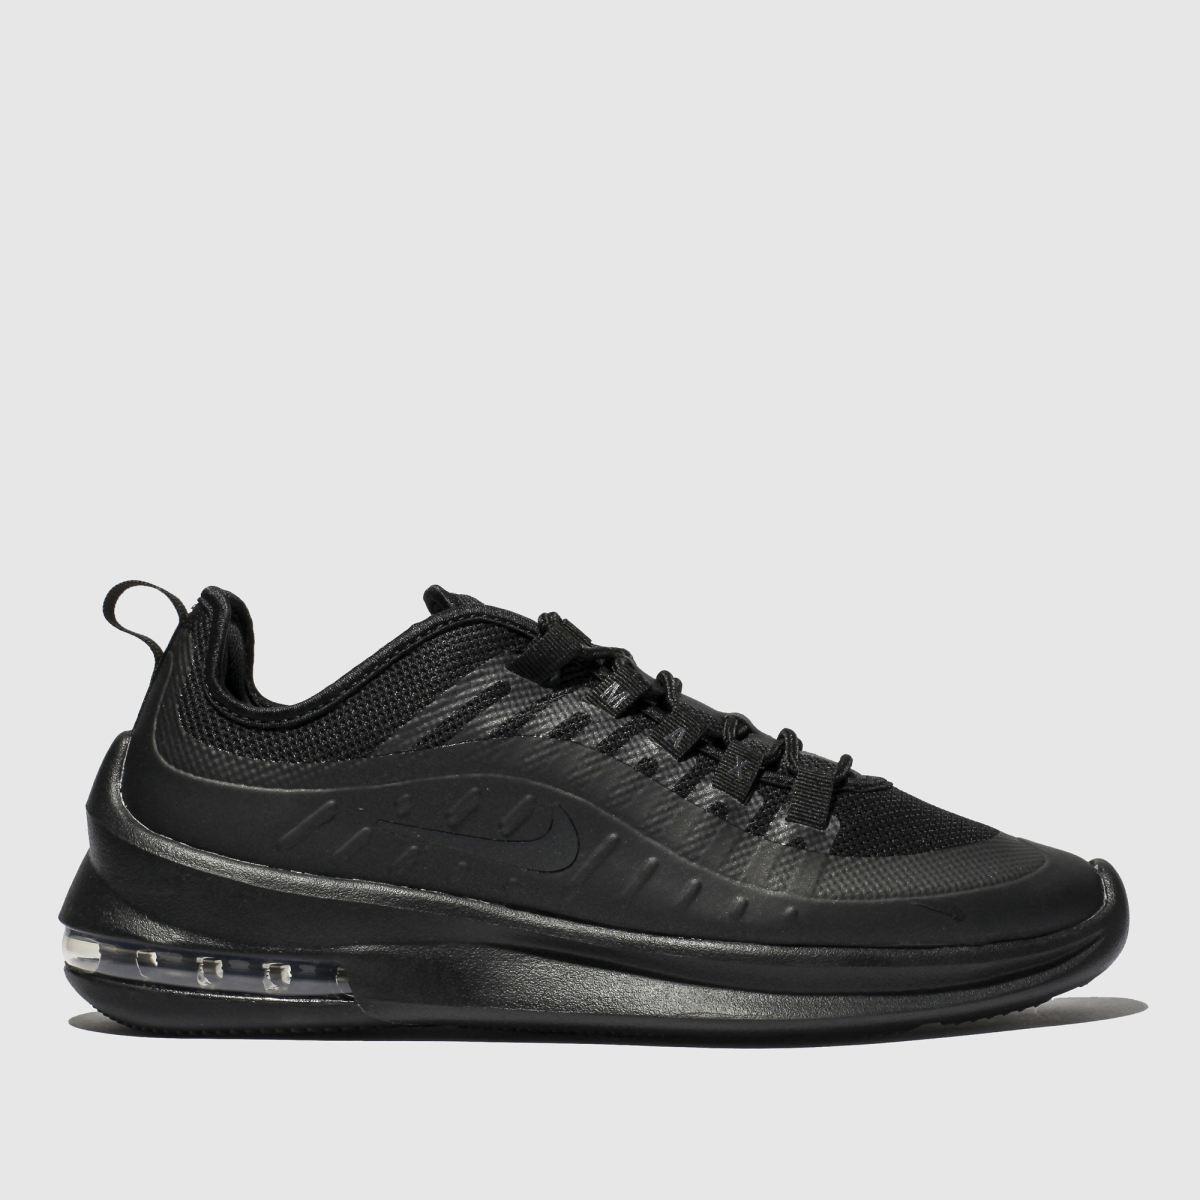 Nike Black Air Max Axis Trainers